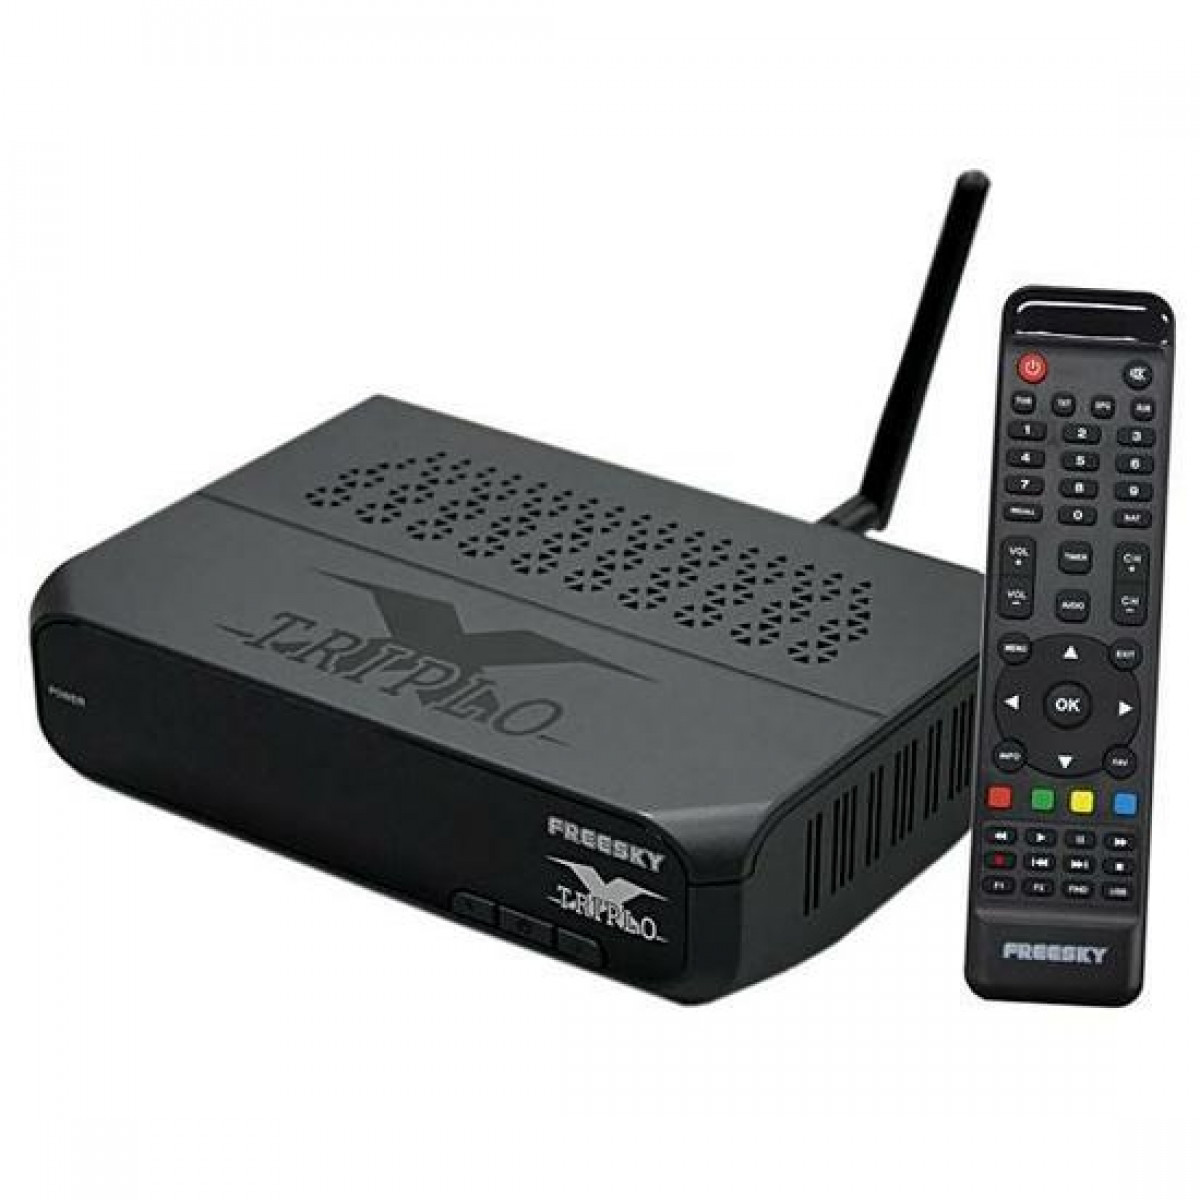 Receptor Freesky TRIPLO X HD ACM 3 Tunner Tunner Tv Digital Terrestre